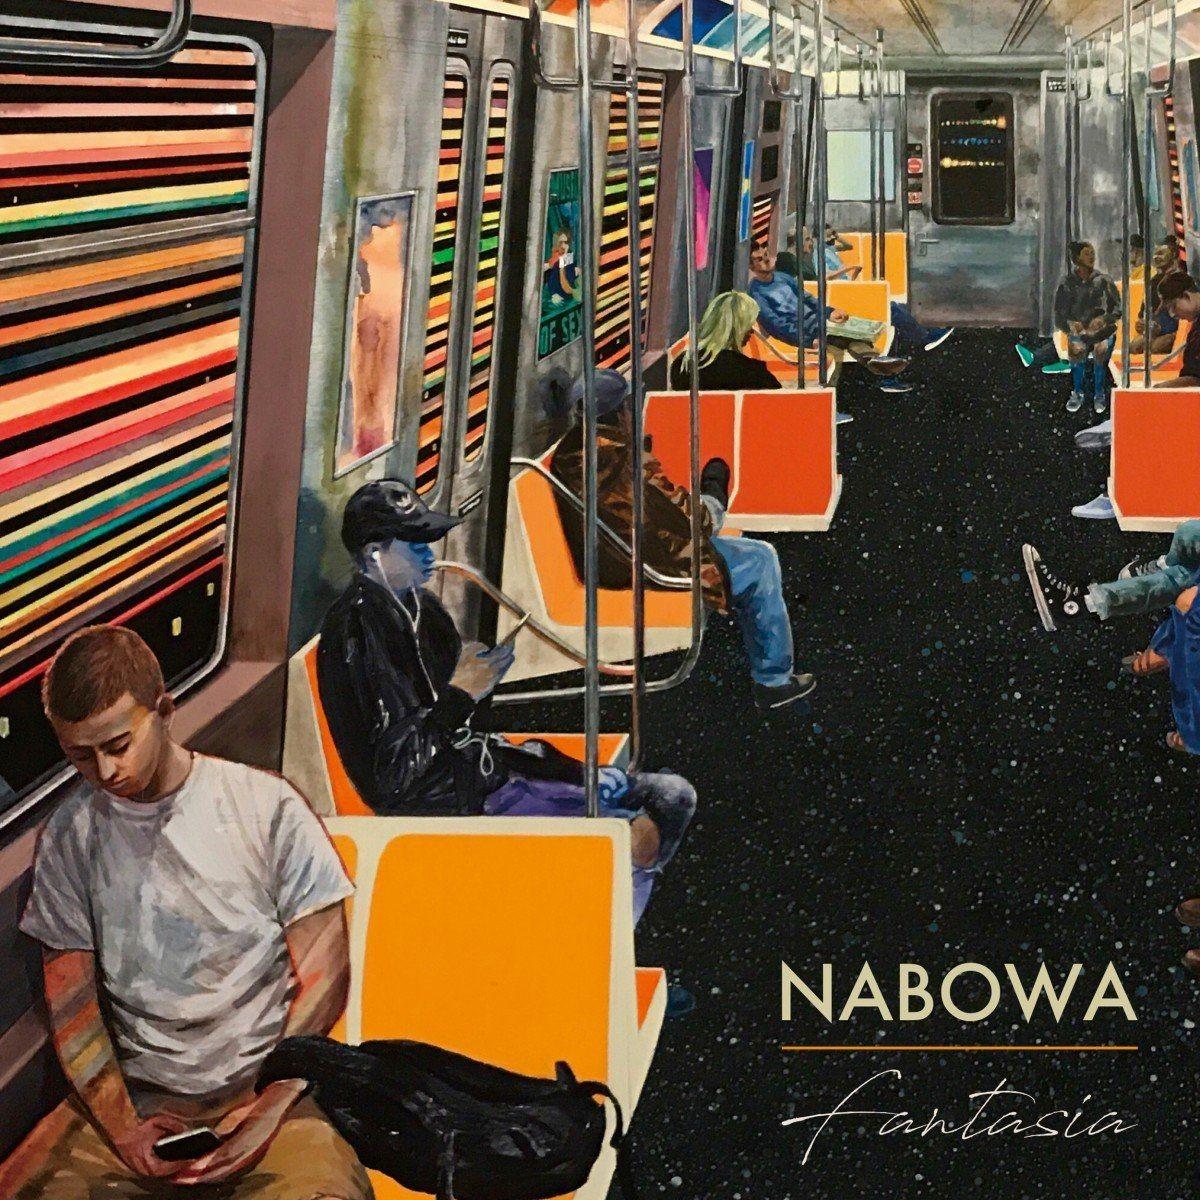 Nabowa – Fantasia [FLAC / WEB] [2021.06.23]